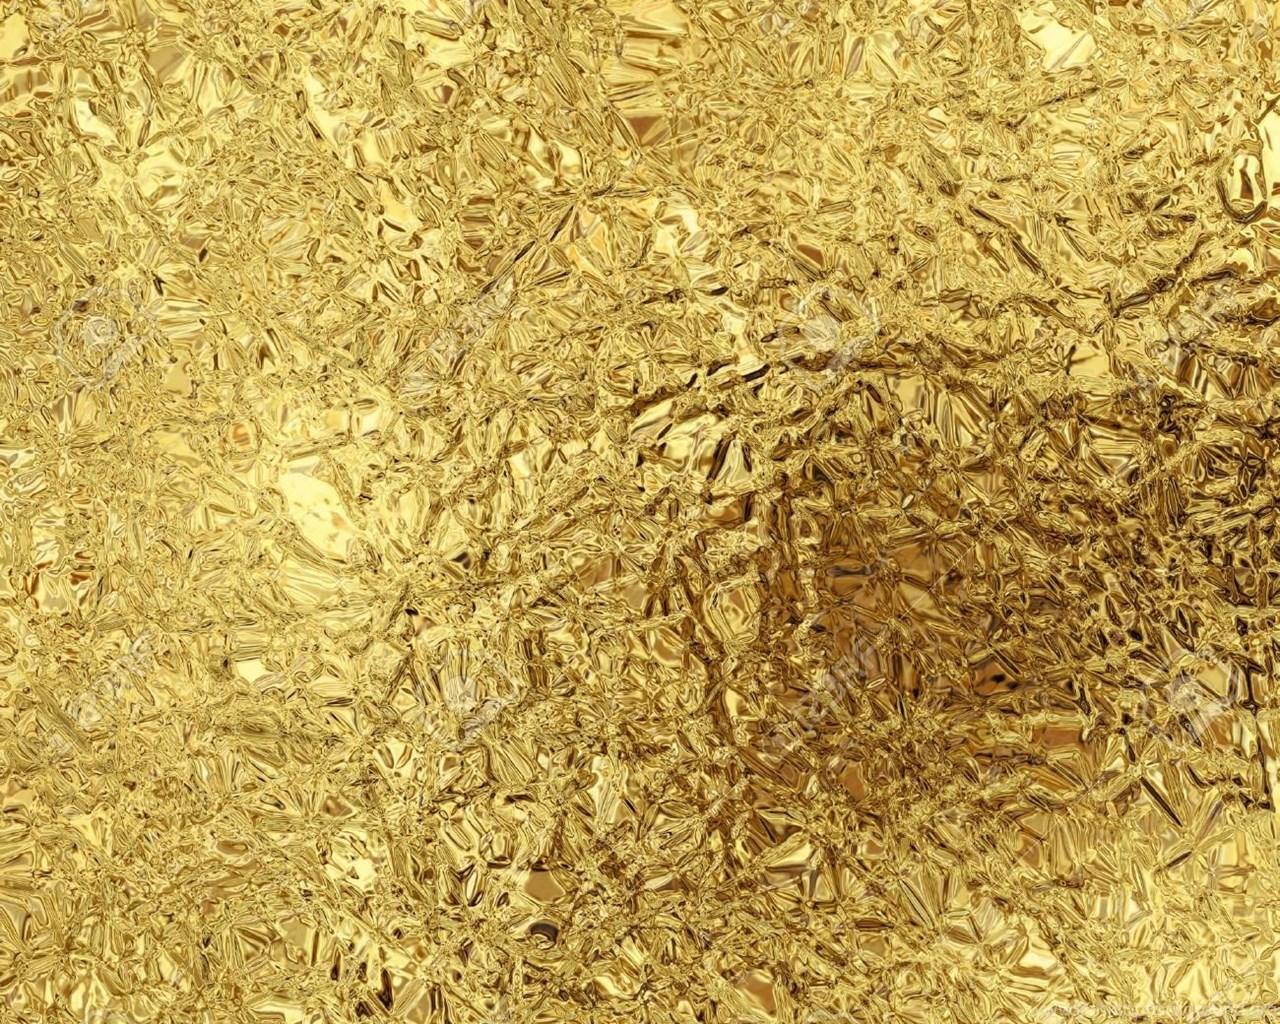 Gold Foil Texture Wallpaper Desktop Background